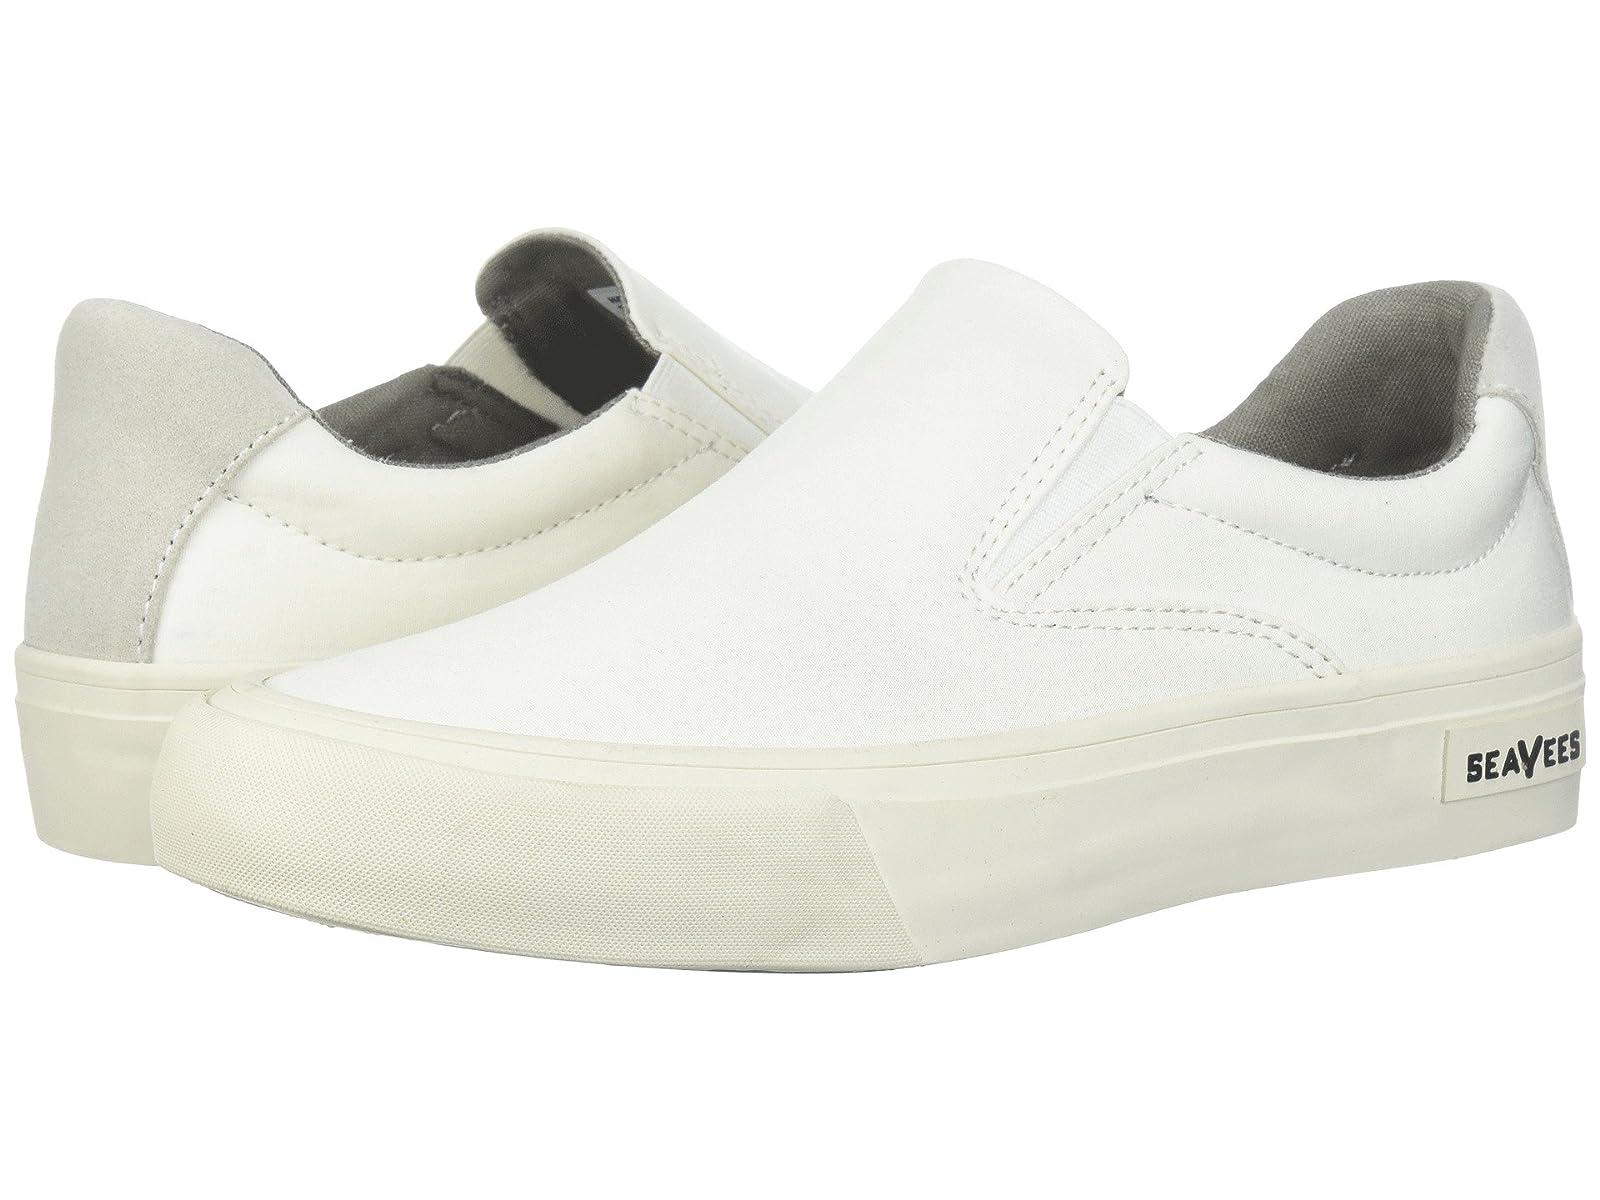 SeaVees 05/66 Hawthorne Slip-On StandardAtmospheric grades have affordable shoes